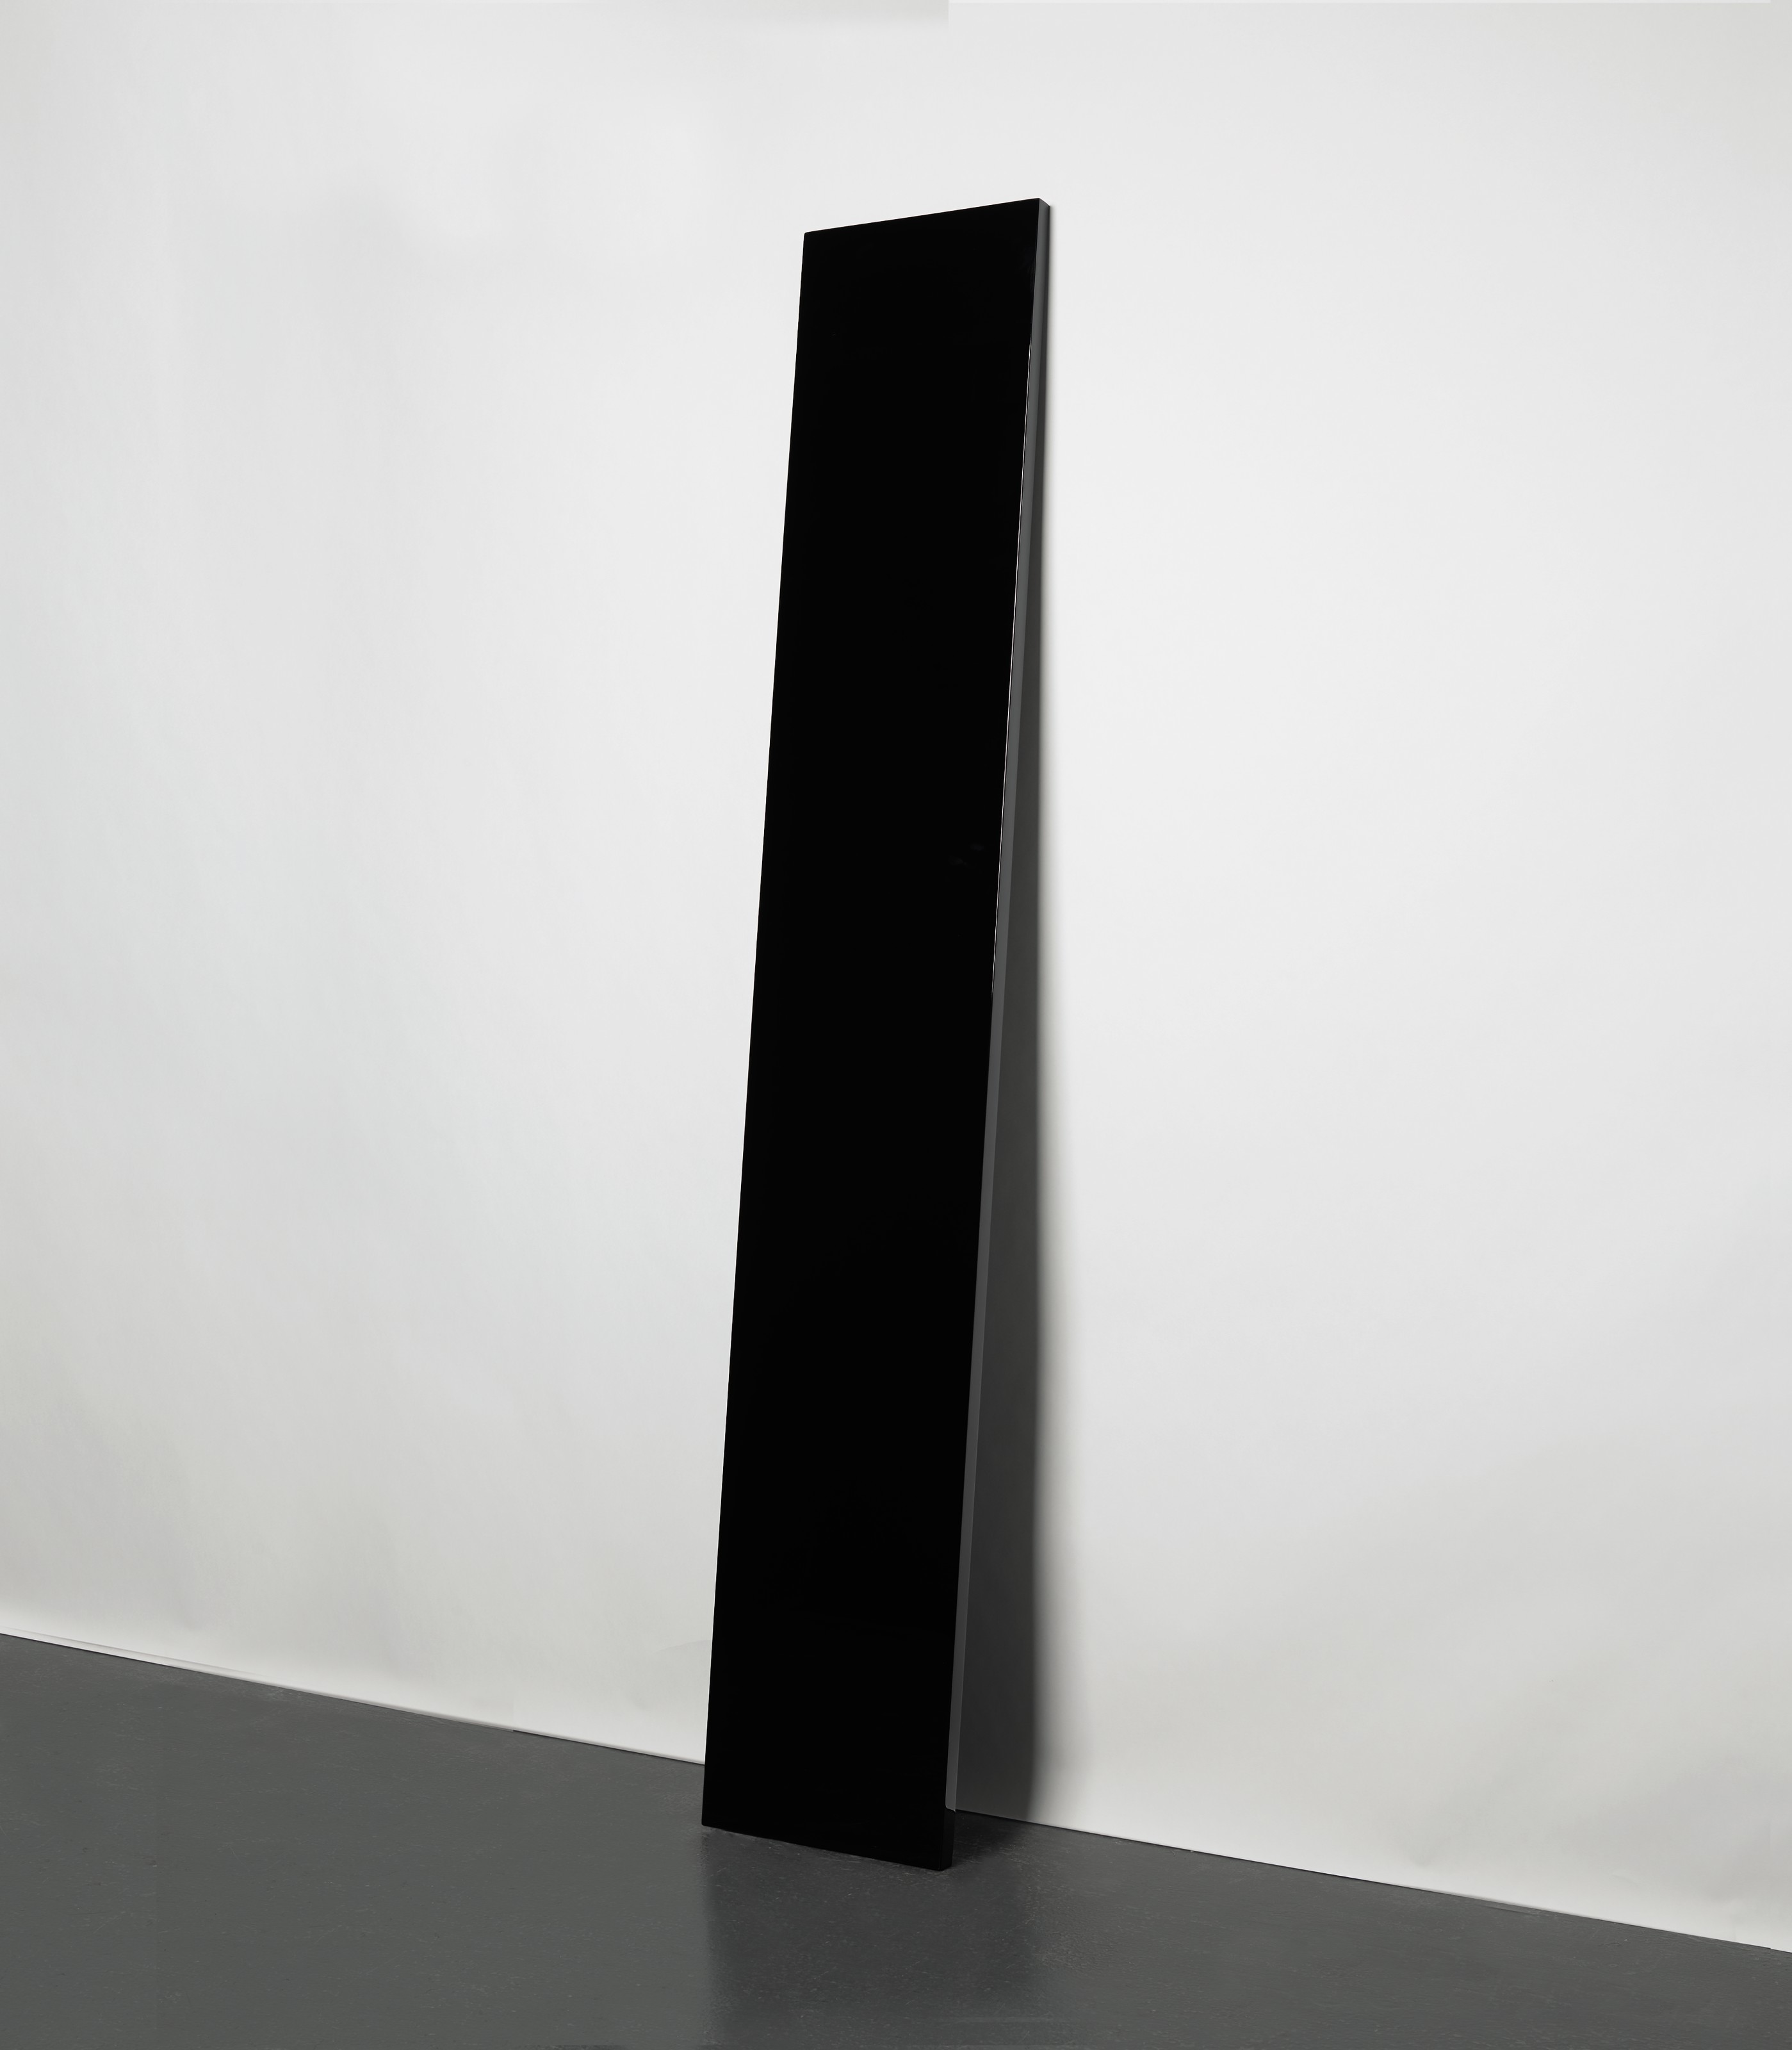 Black Plank